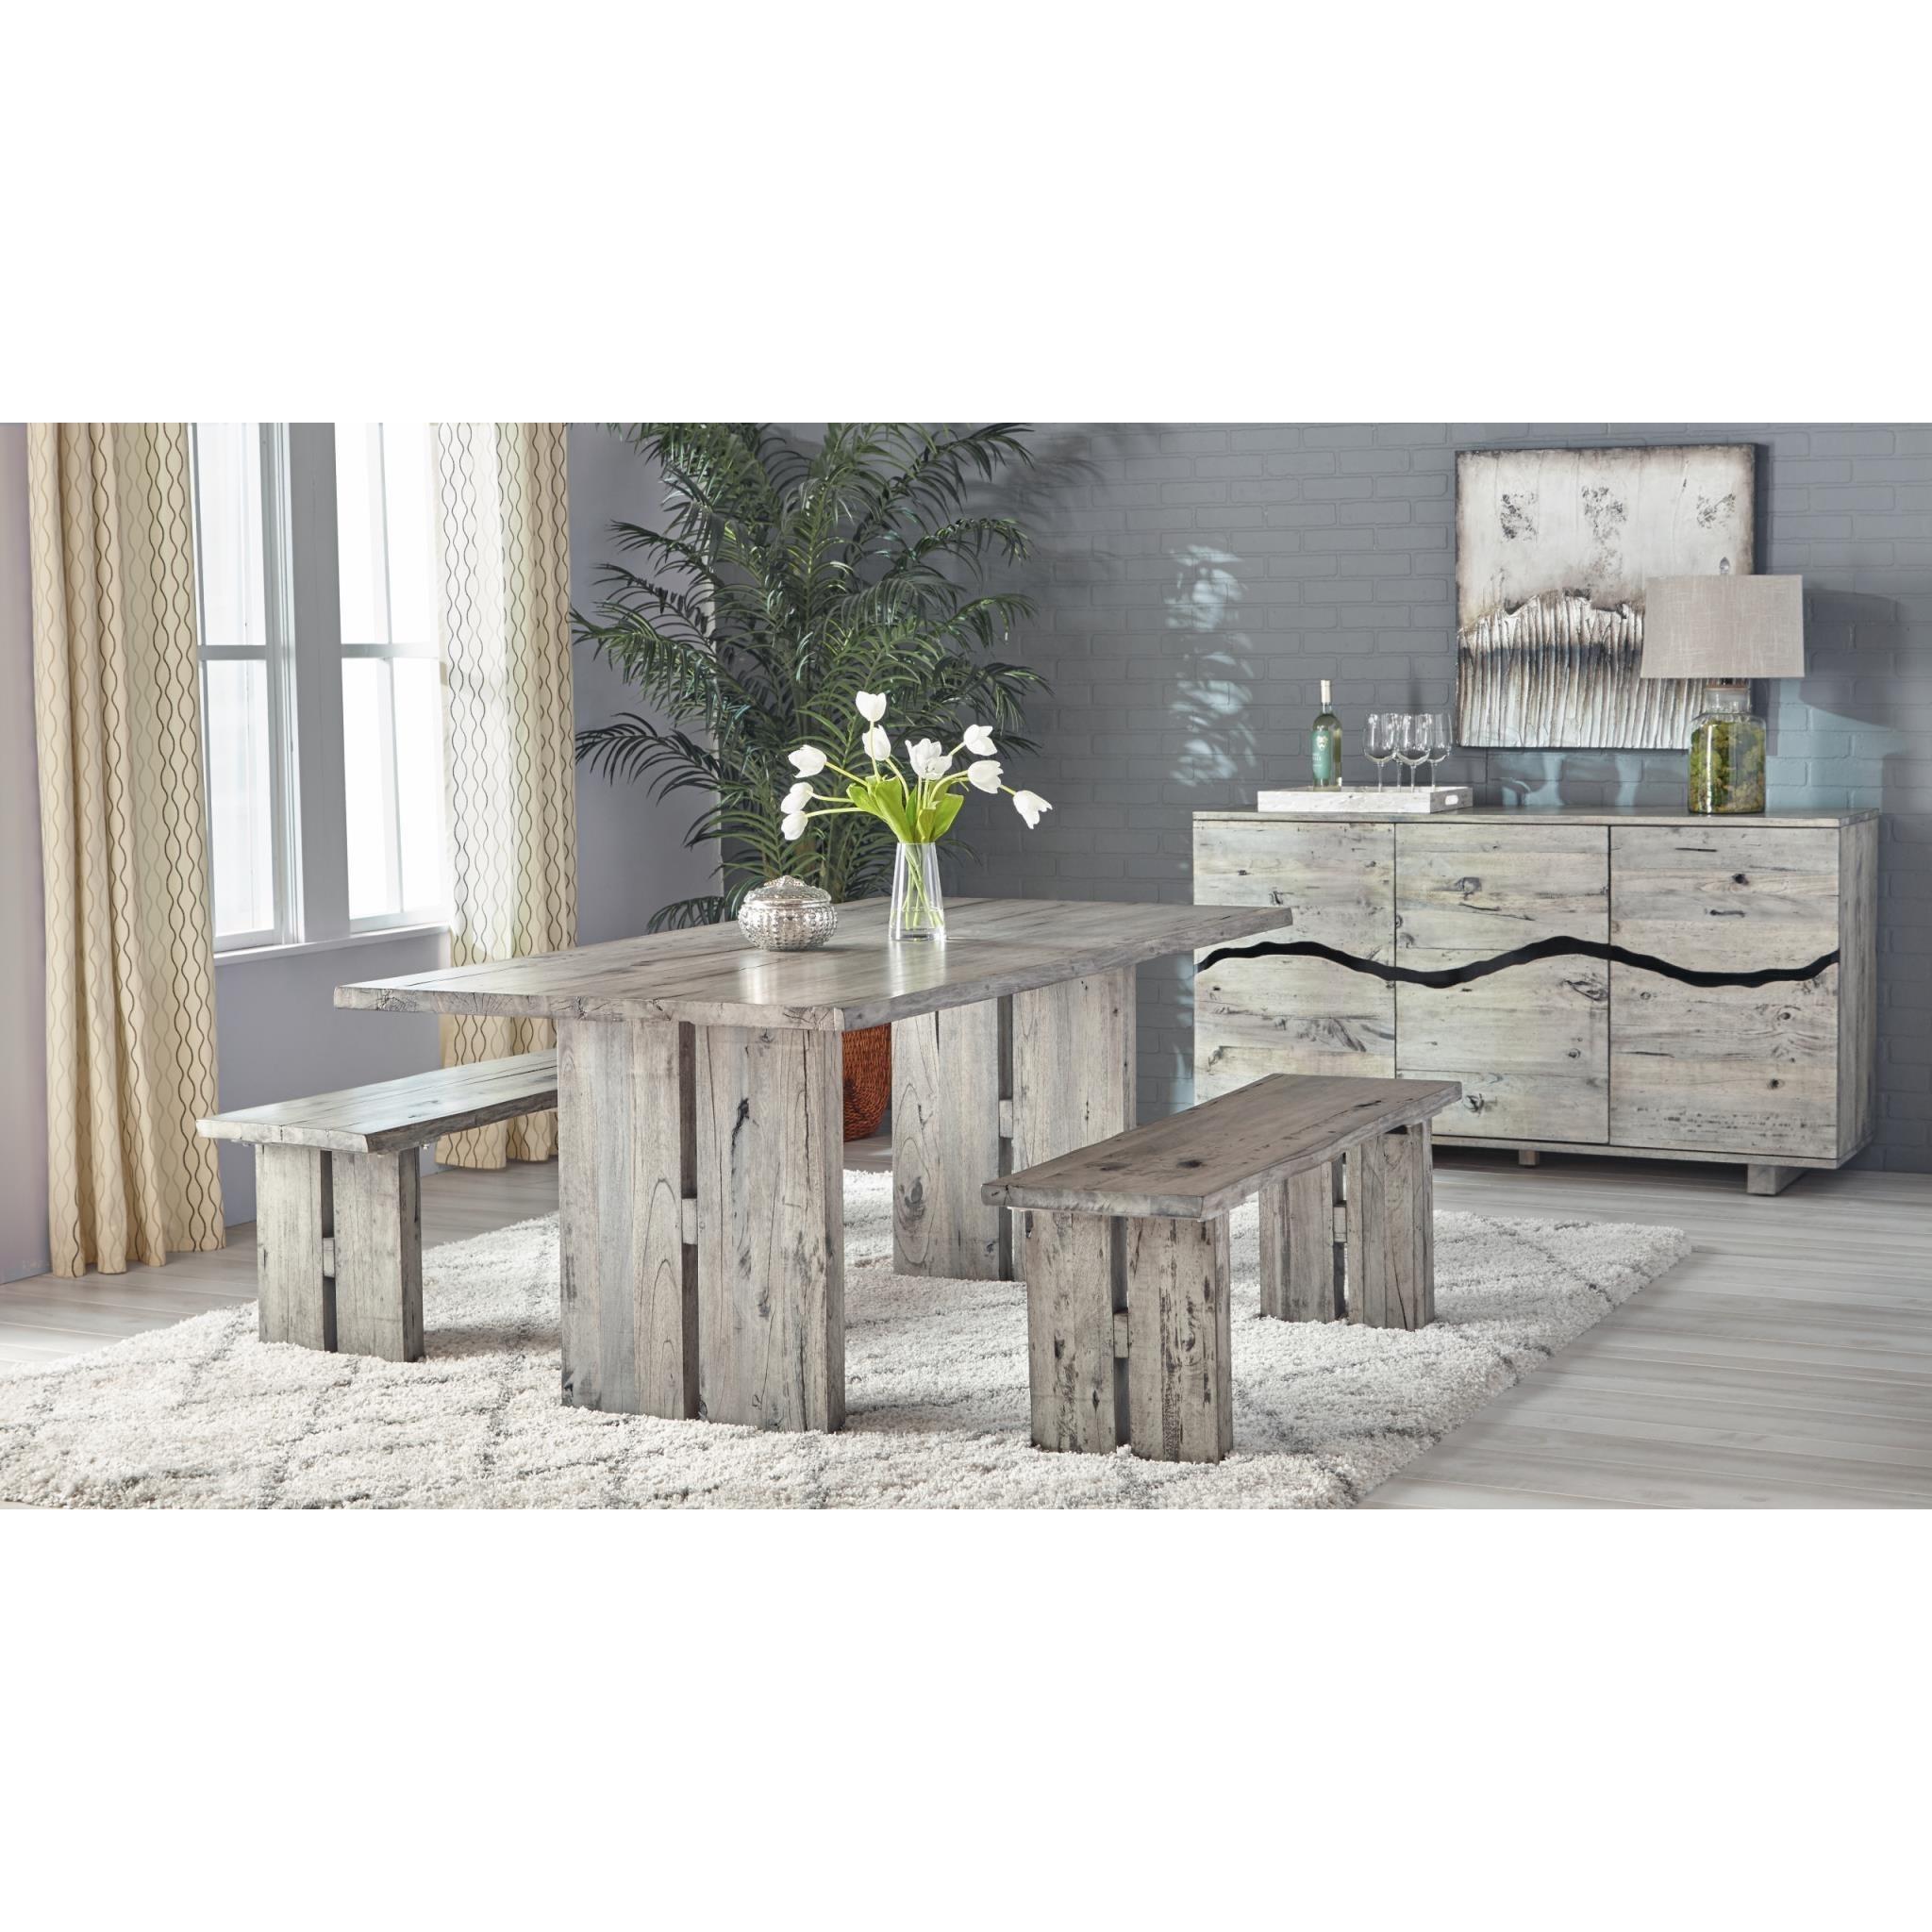 Ordinaire Napa Furniture Designs Renewal By Napa Dining Room Group